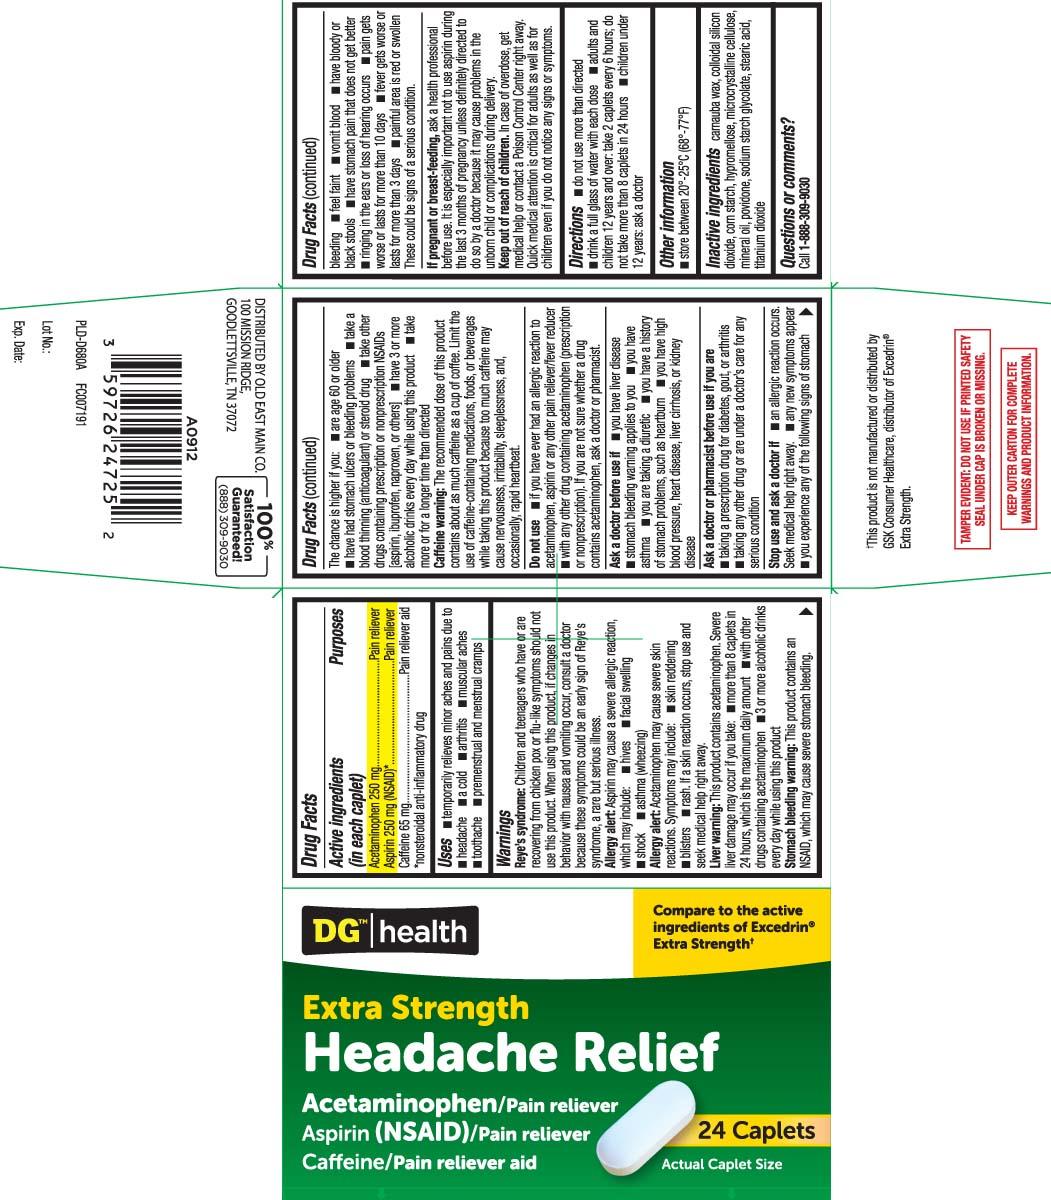 Acetaminophen 250 mg, Aspirin 250 mg (NSAID)* Caffeine 65 mg, *nonsteroidal anti-inflammatory drug